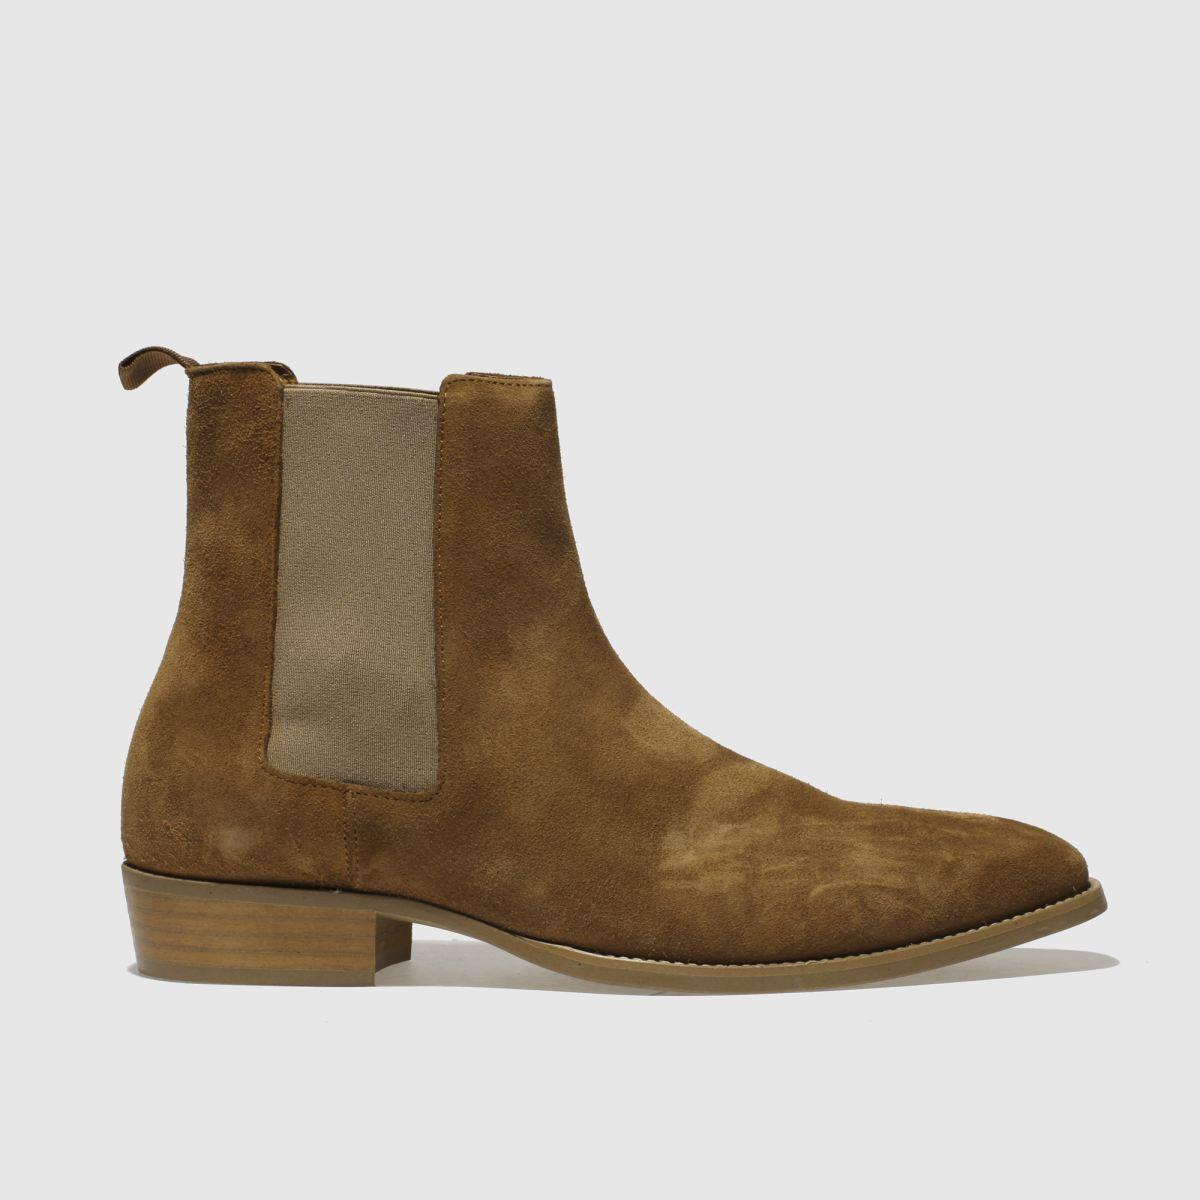 Schuh Tan Pete Chelsea Boots